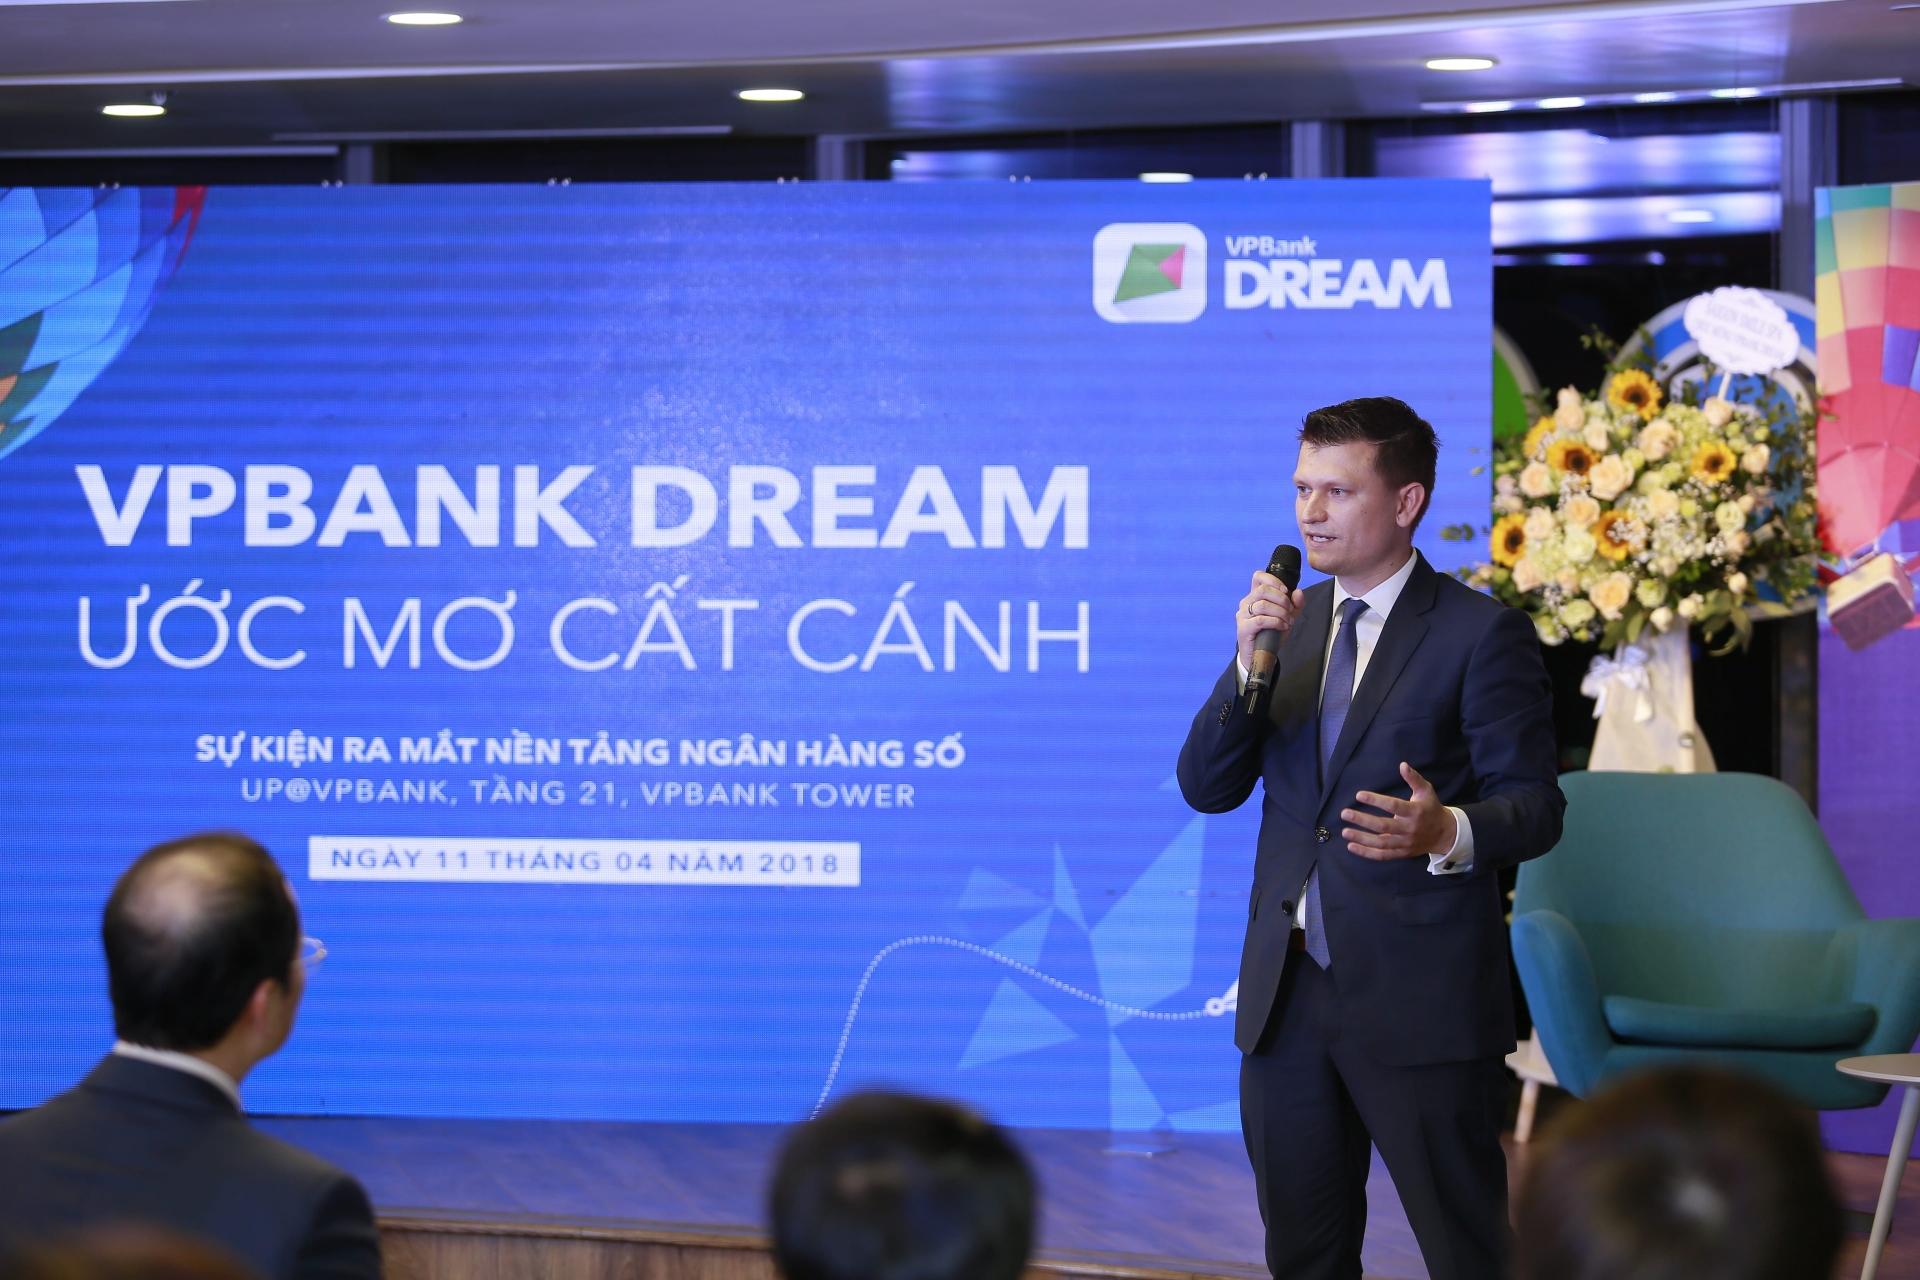 new vpbank app makes dreams come true